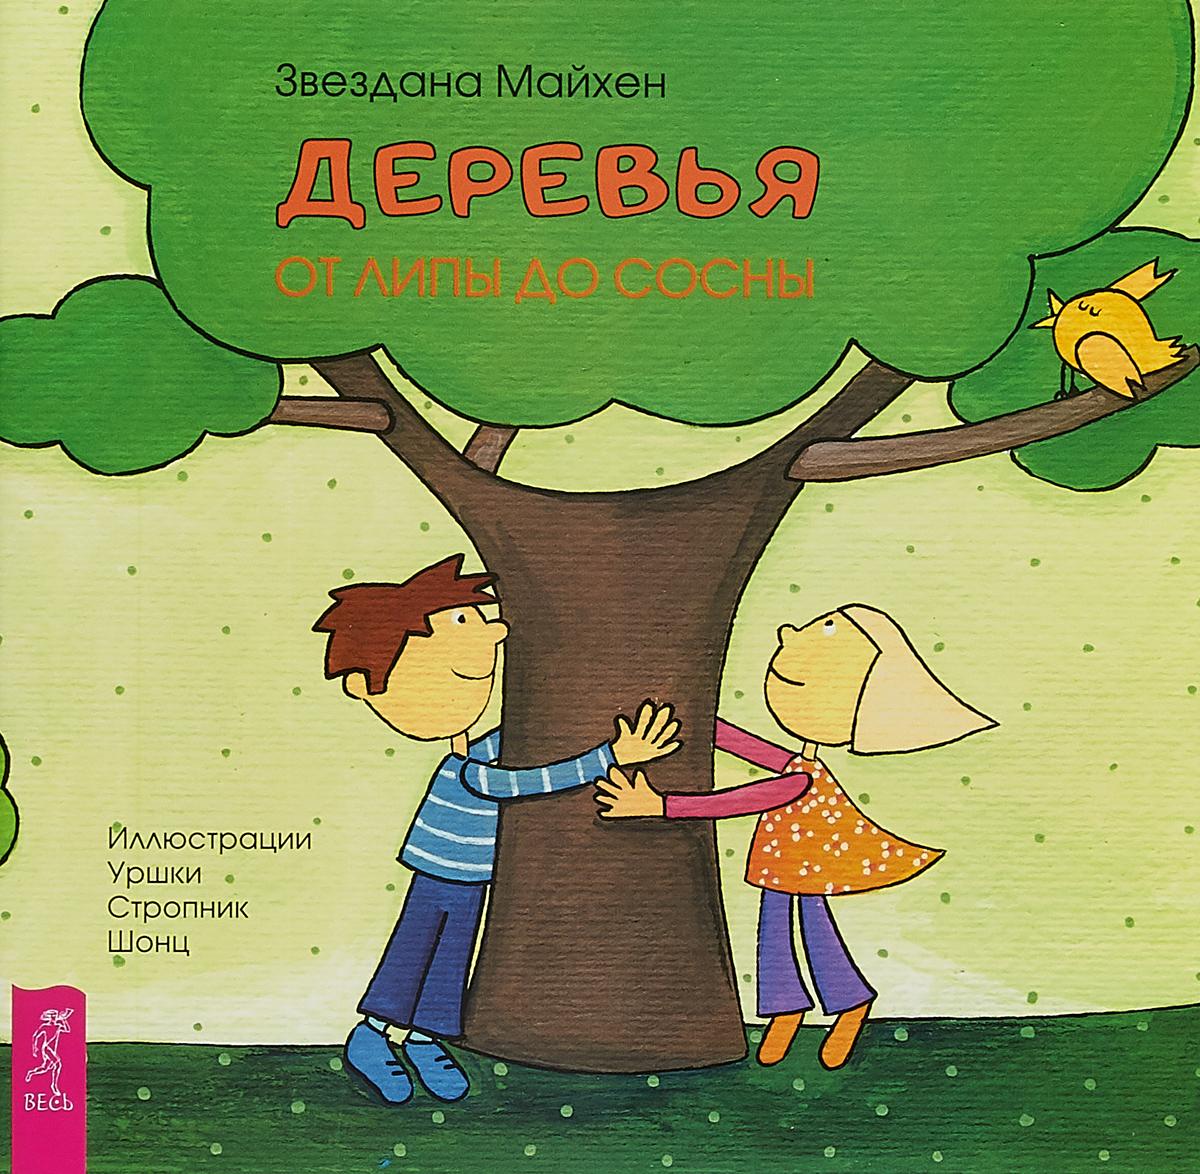 Звездана Майхен Деревья: от липы до сосны (3352) майхен з деревья от липы до сосны